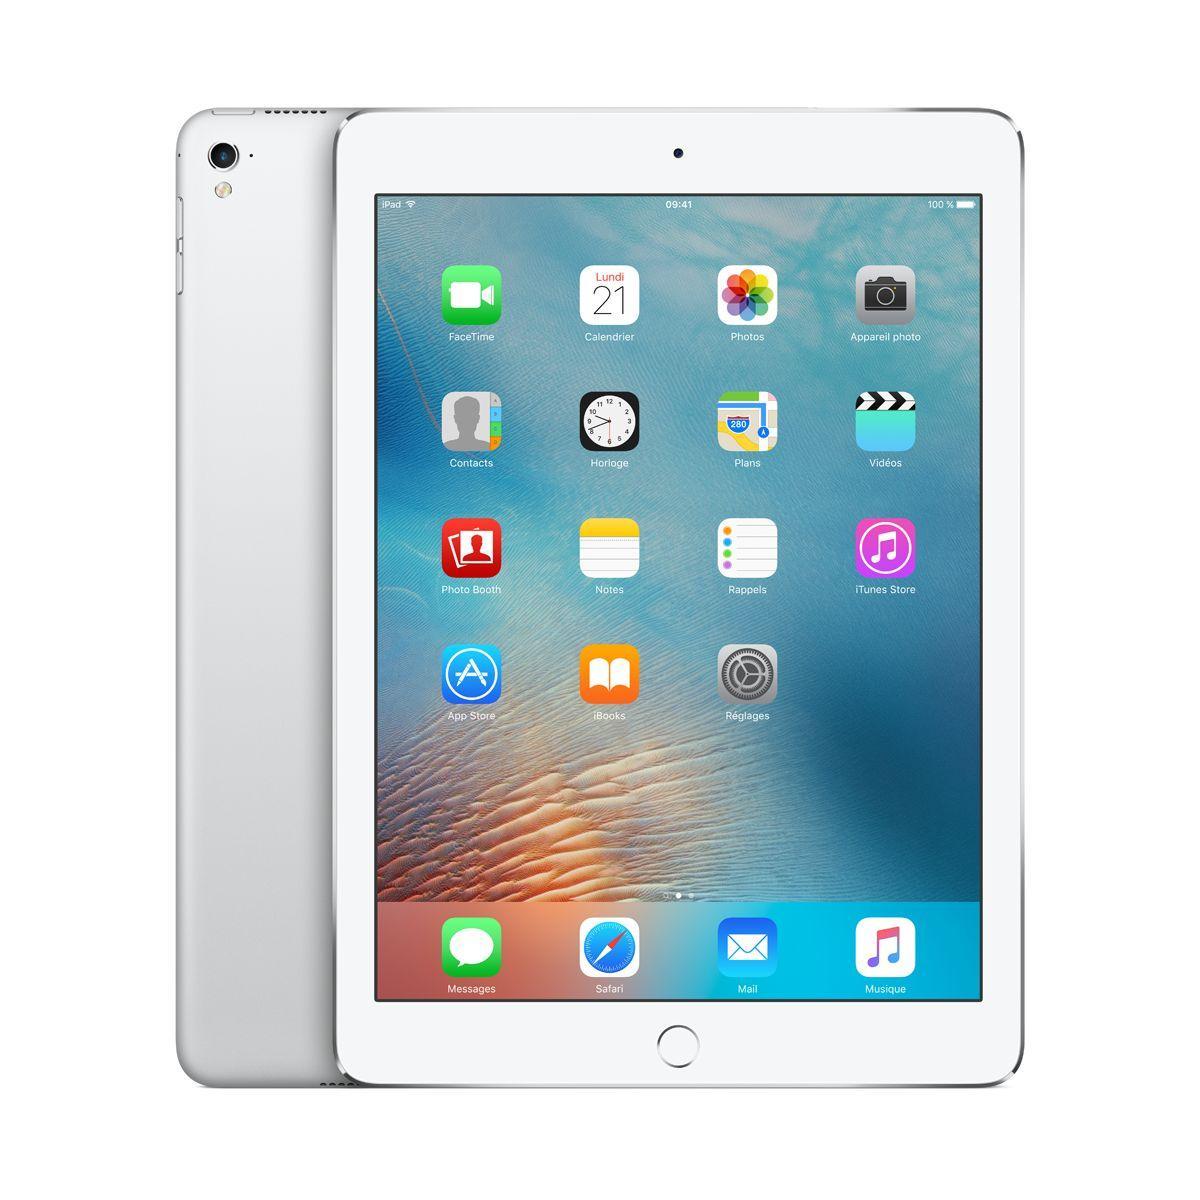 Apple ipad pro 9.7 256go argent (photo)